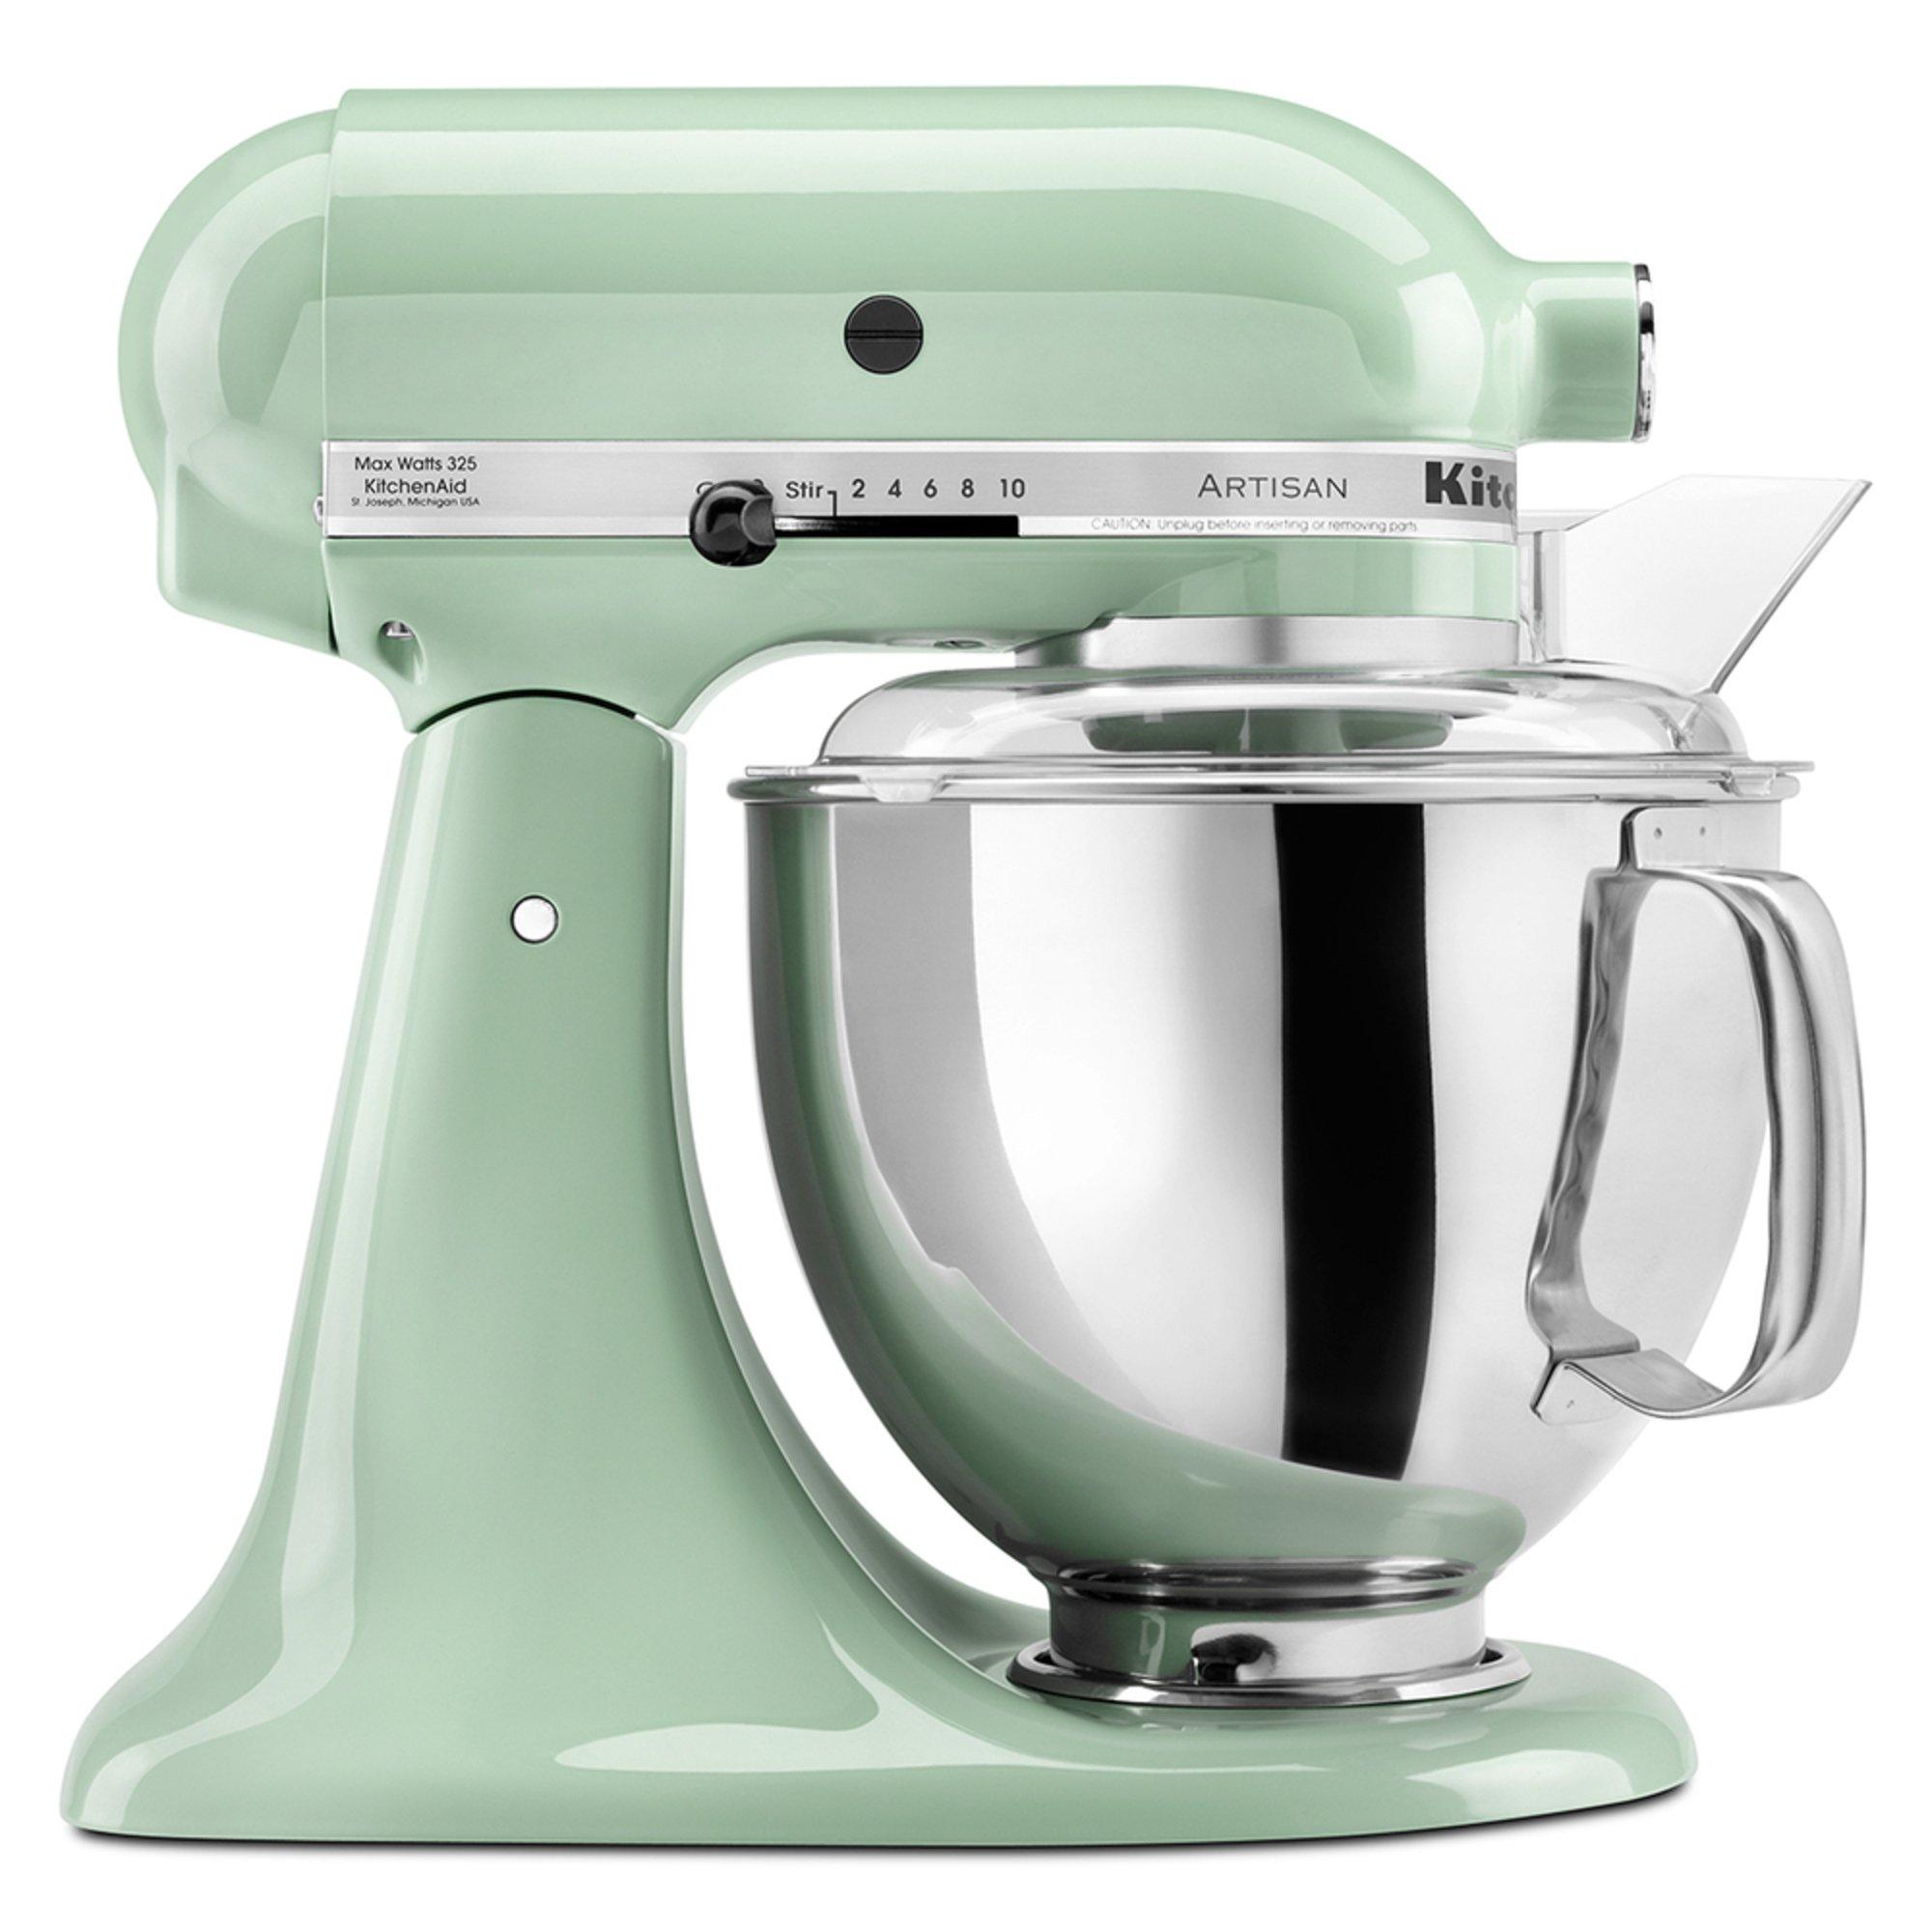 Kitchenaid artisan series 5 quart tilt head stand mixer pistachio ksm150pspt stand mixers - Kitchenaid artisan qt stand mixer sale ...